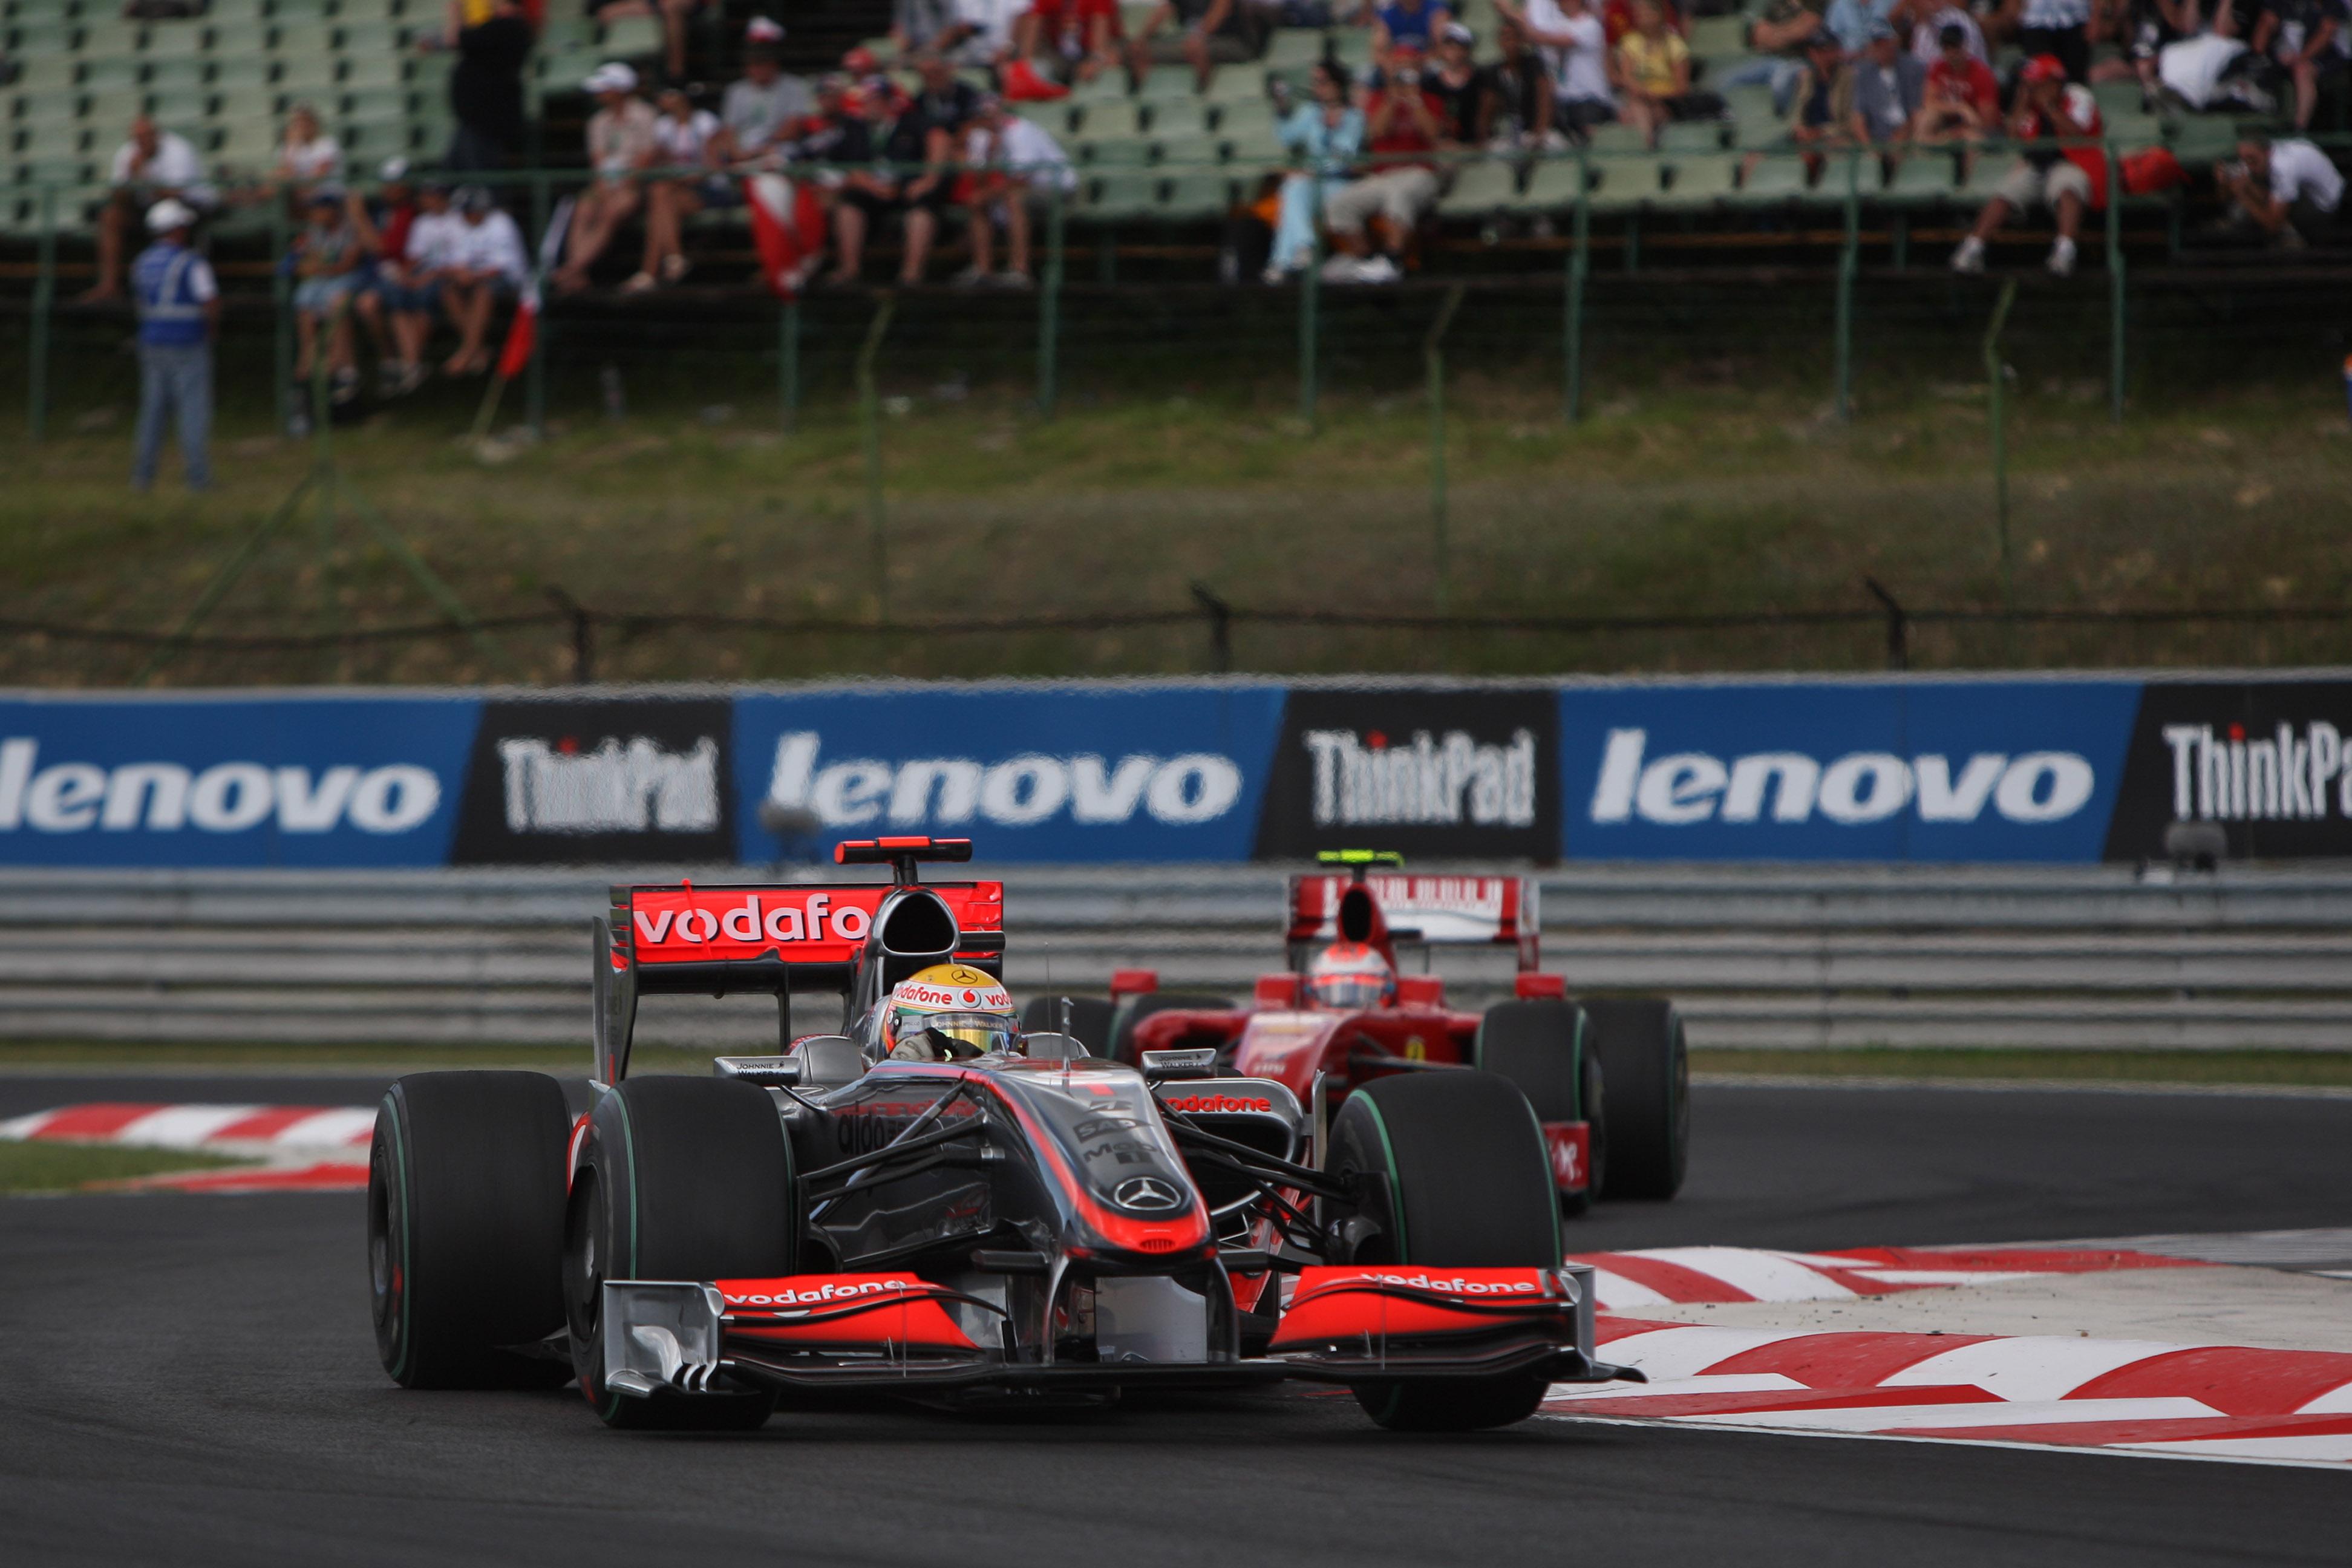 Lewis Hamilton McLaren Hungarian Grand Prix 2009